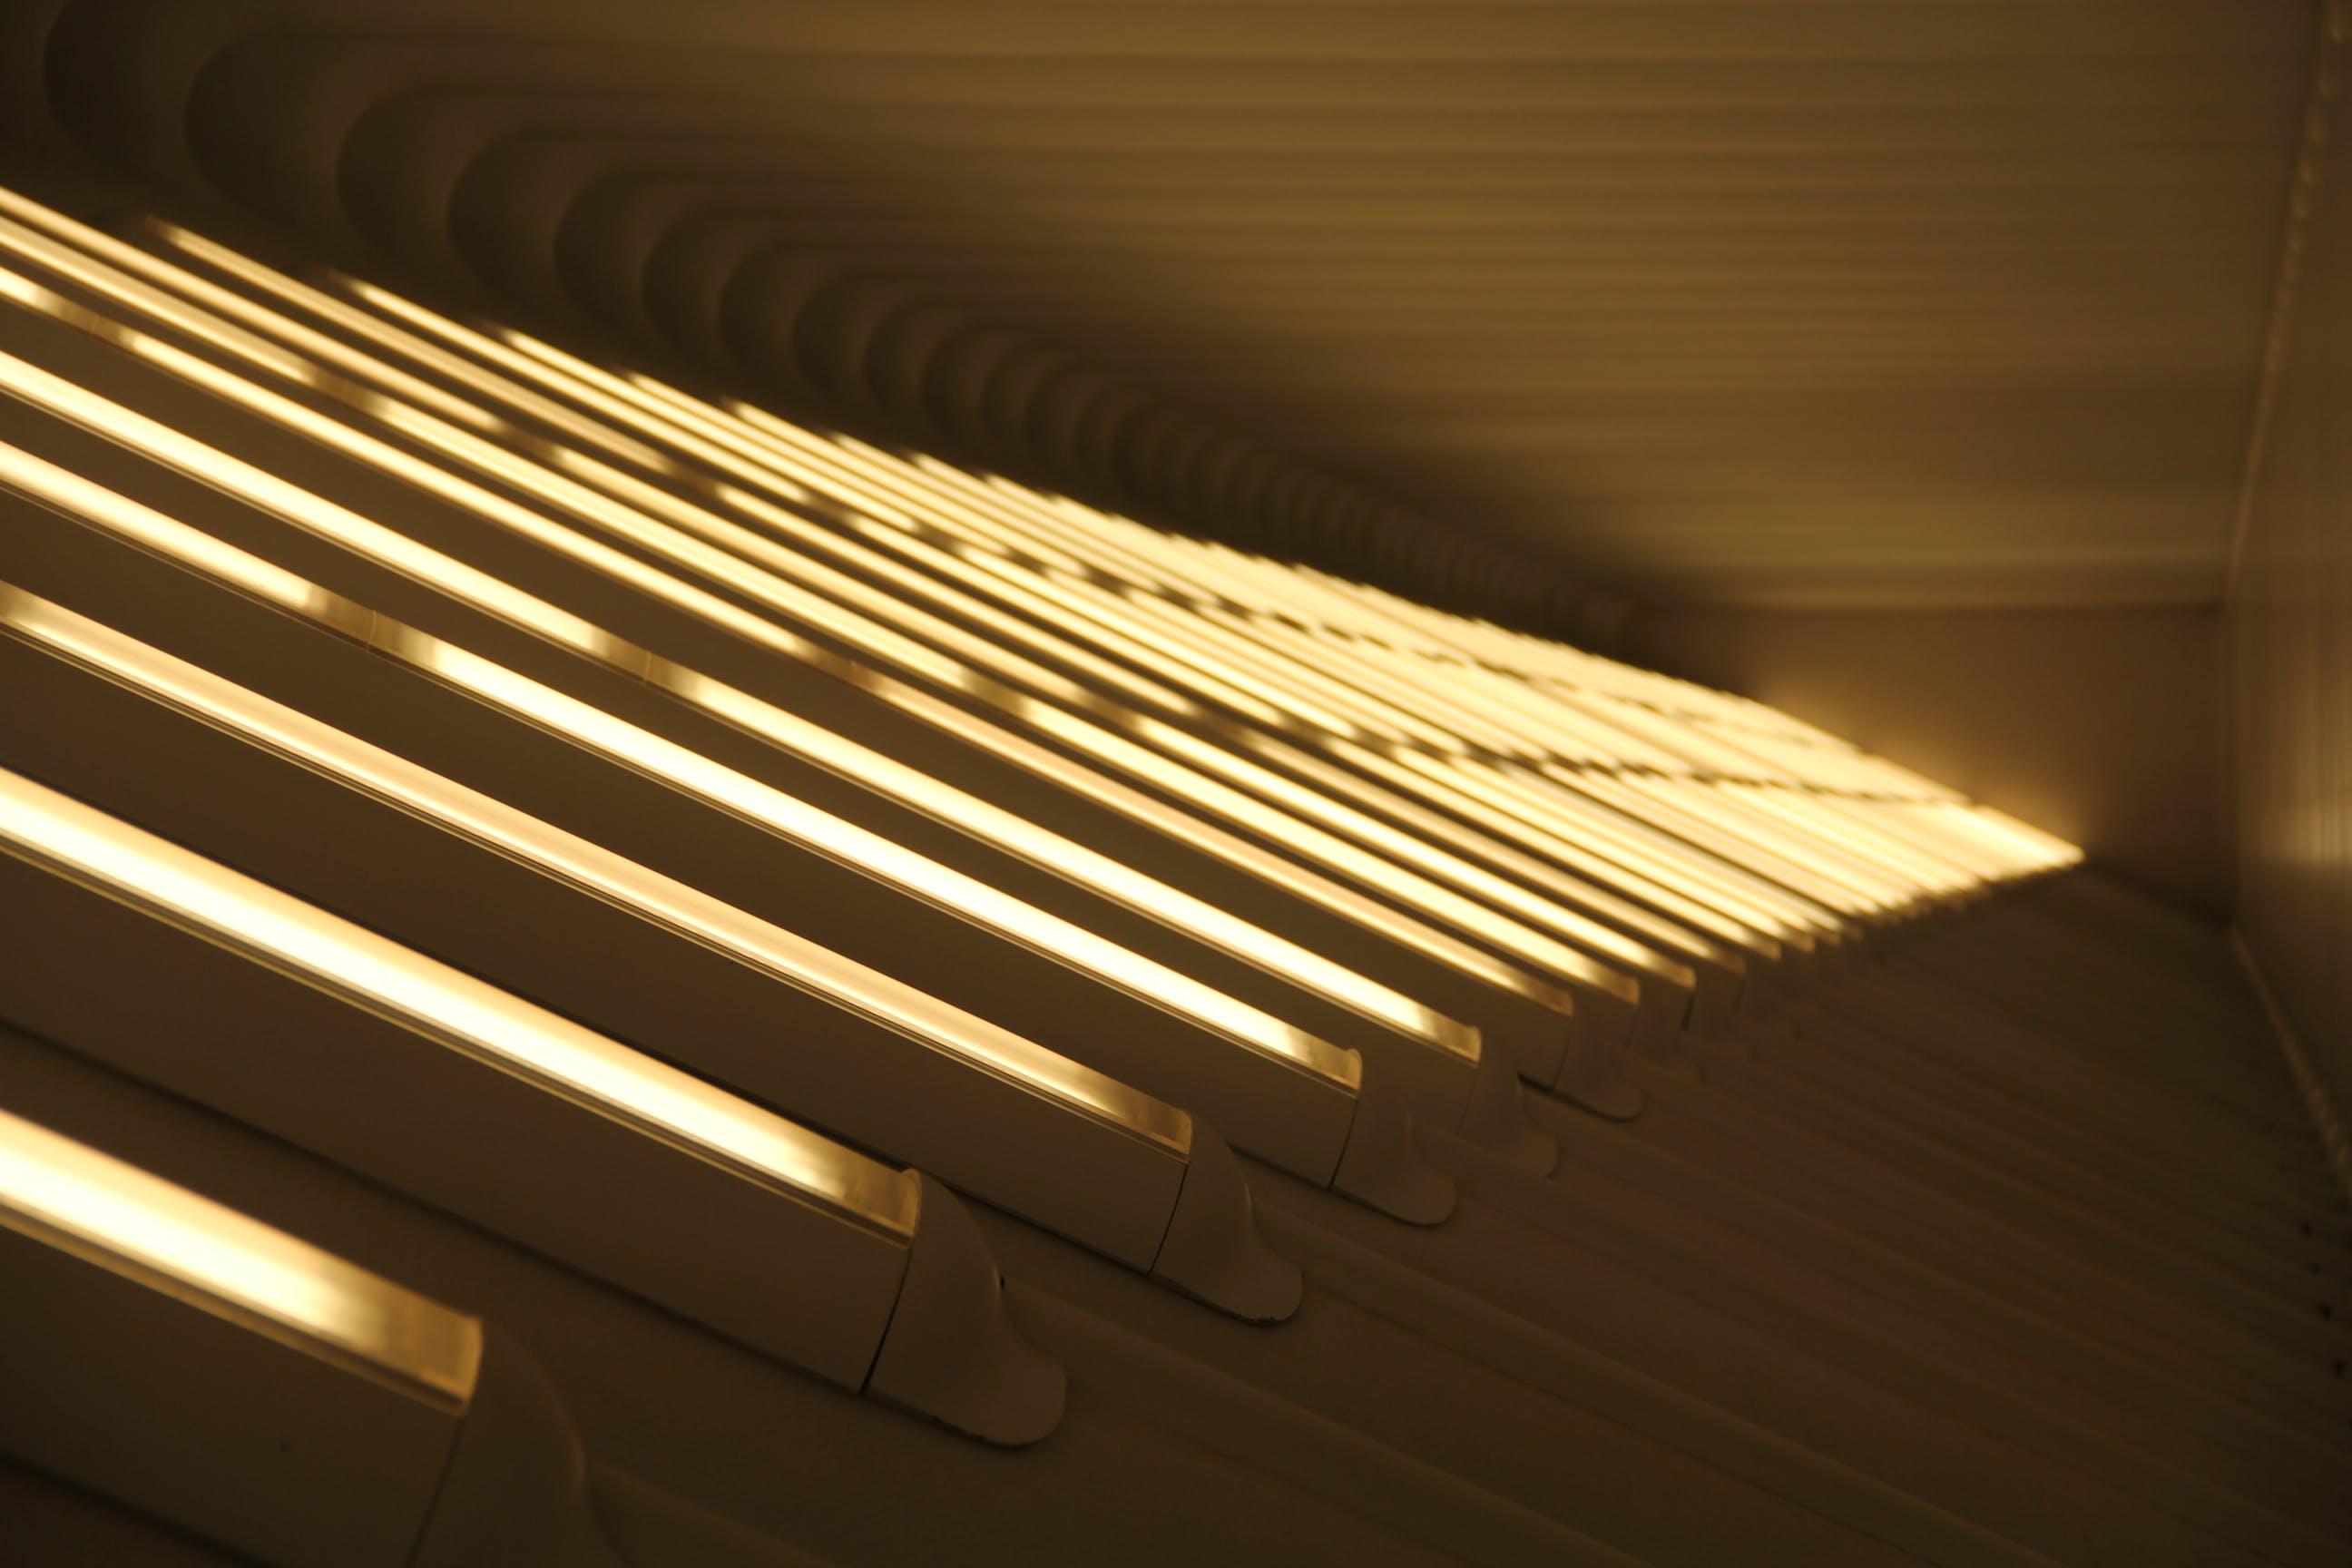 Free stock photo of illuminated area, lighting, lighting arrangement, pattern